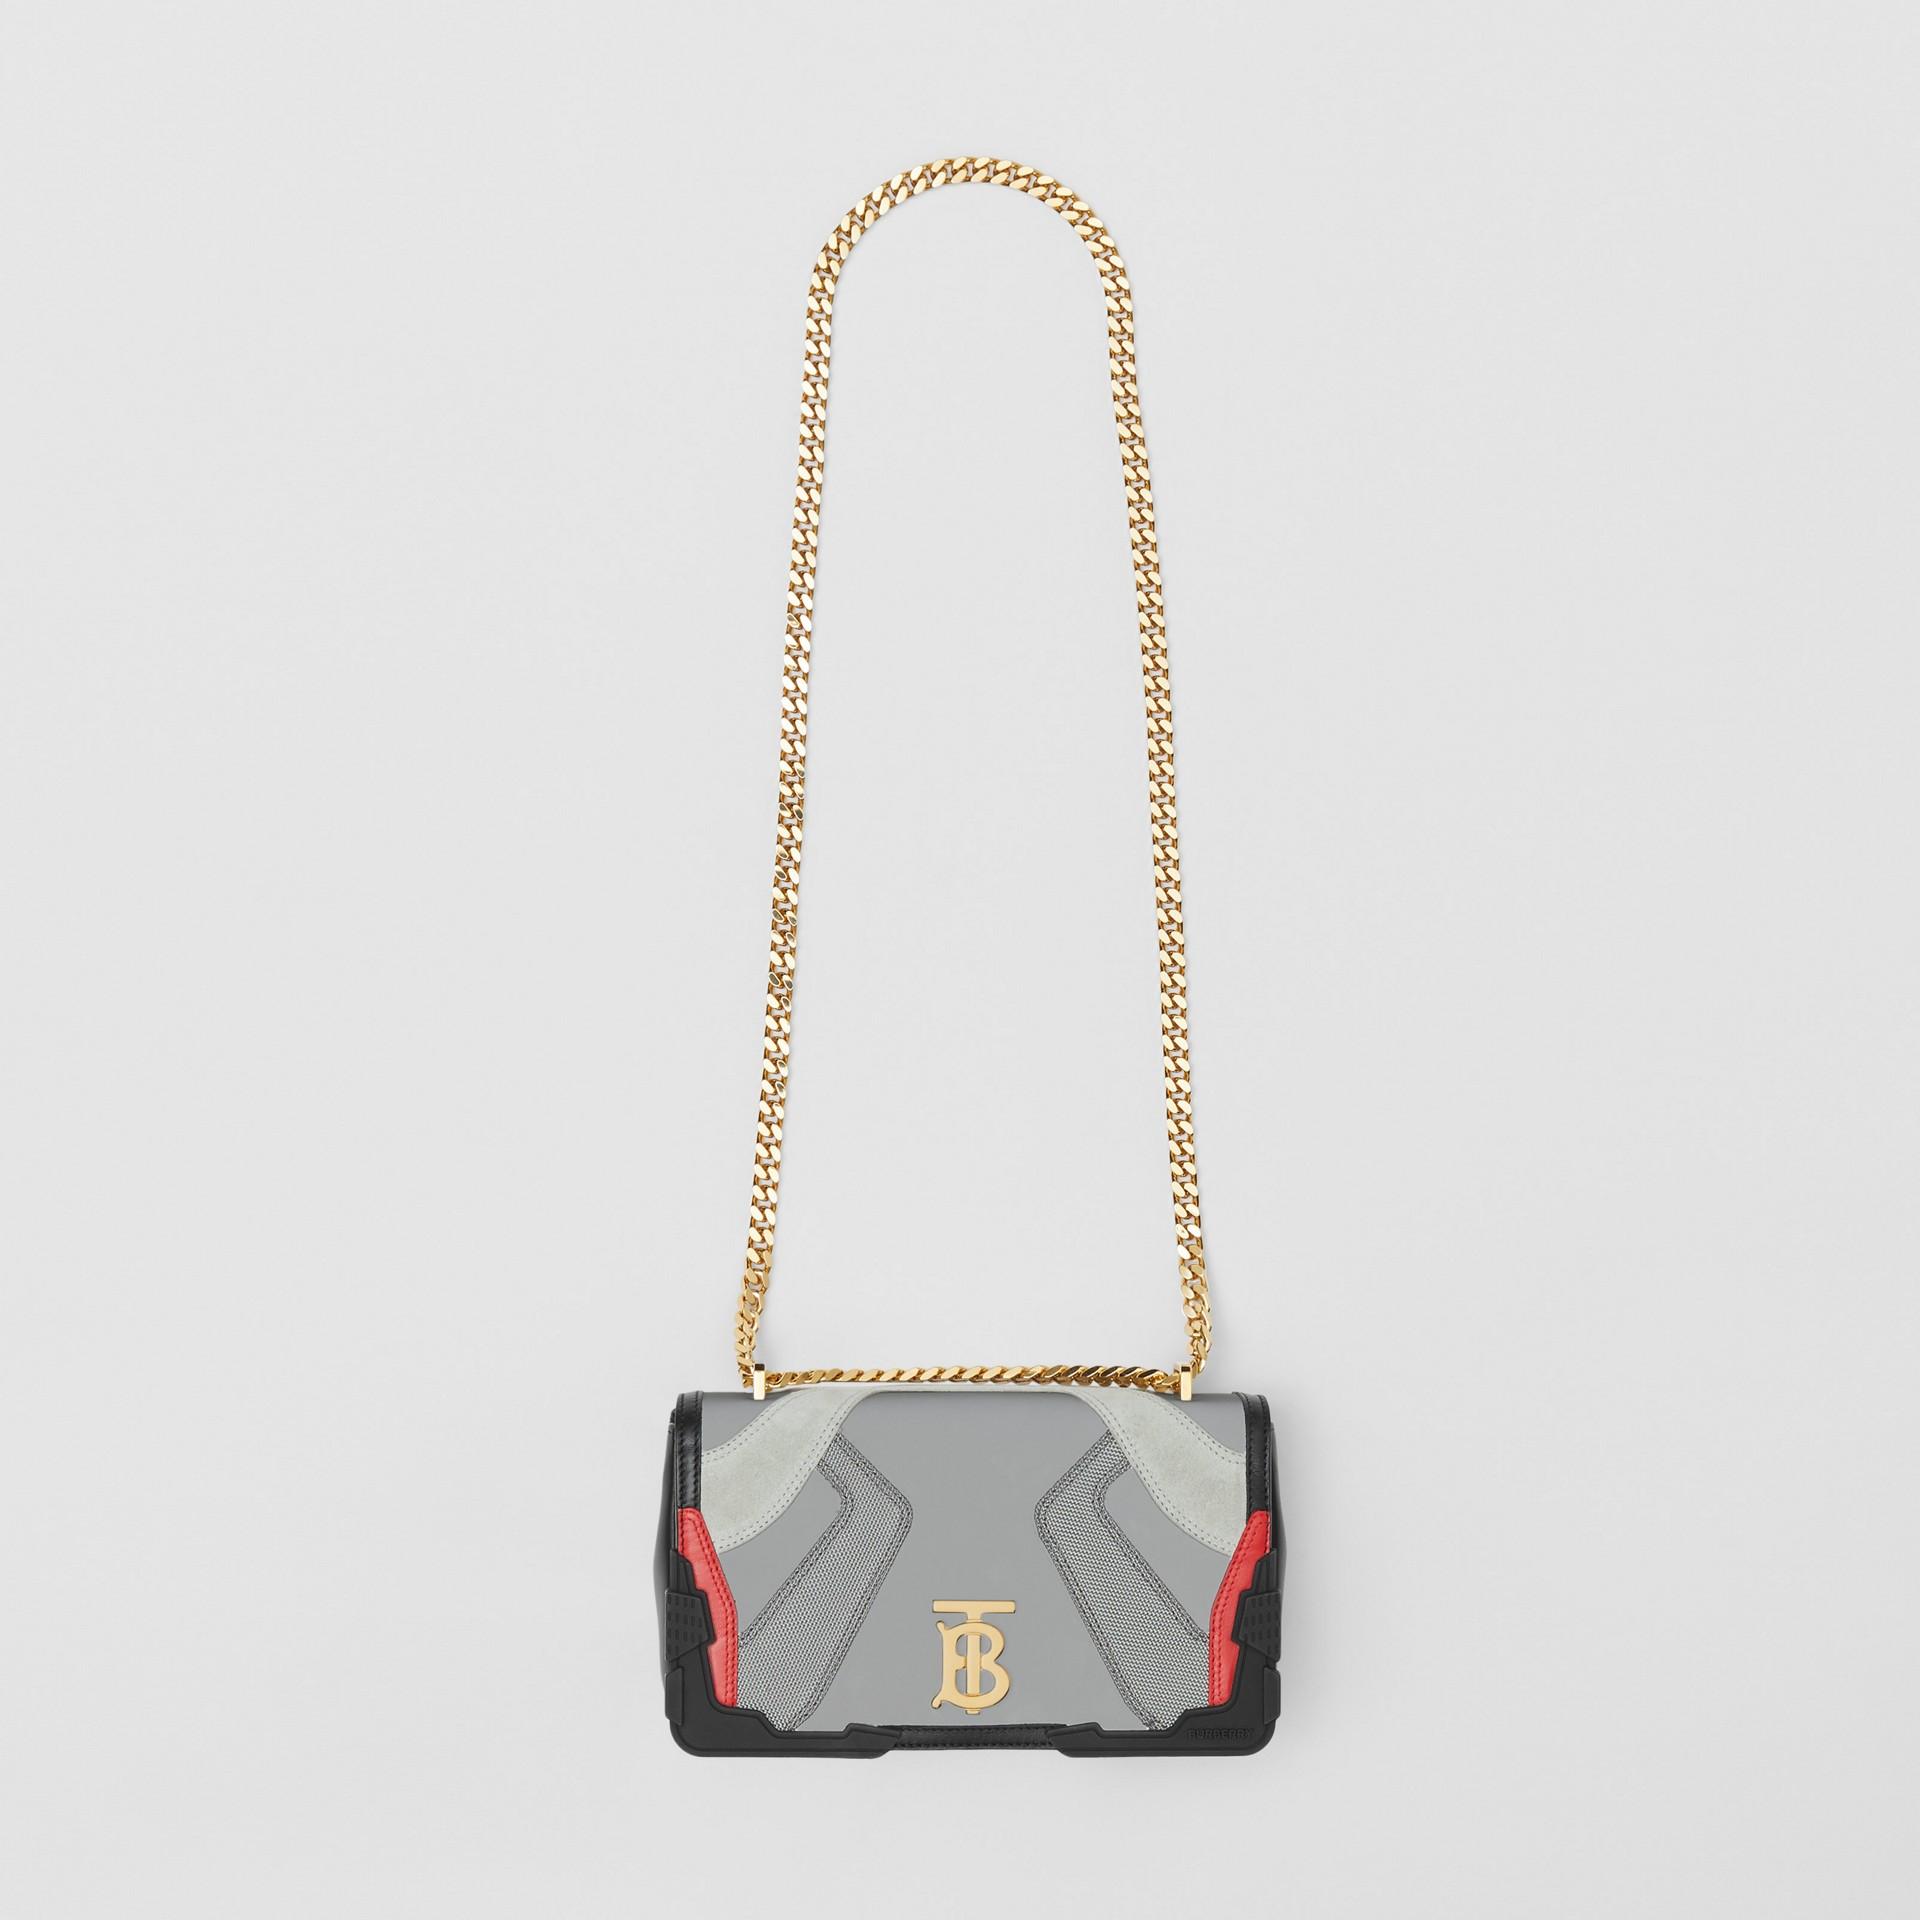 Small Appliqué Leather Lola Bag in Multicolour - Women | Burberry - gallery image 2